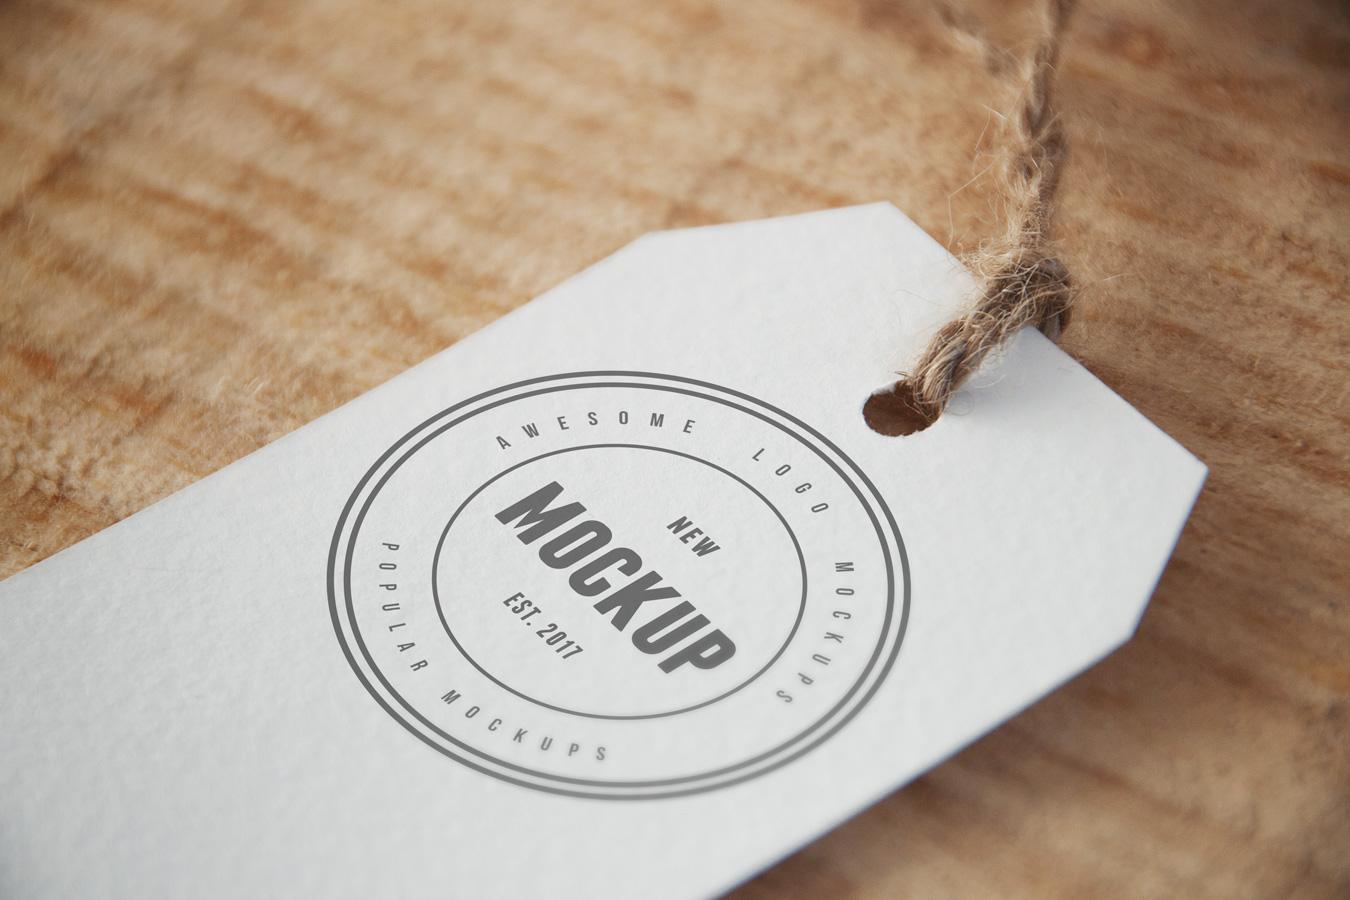 cloth tag free logo mockup